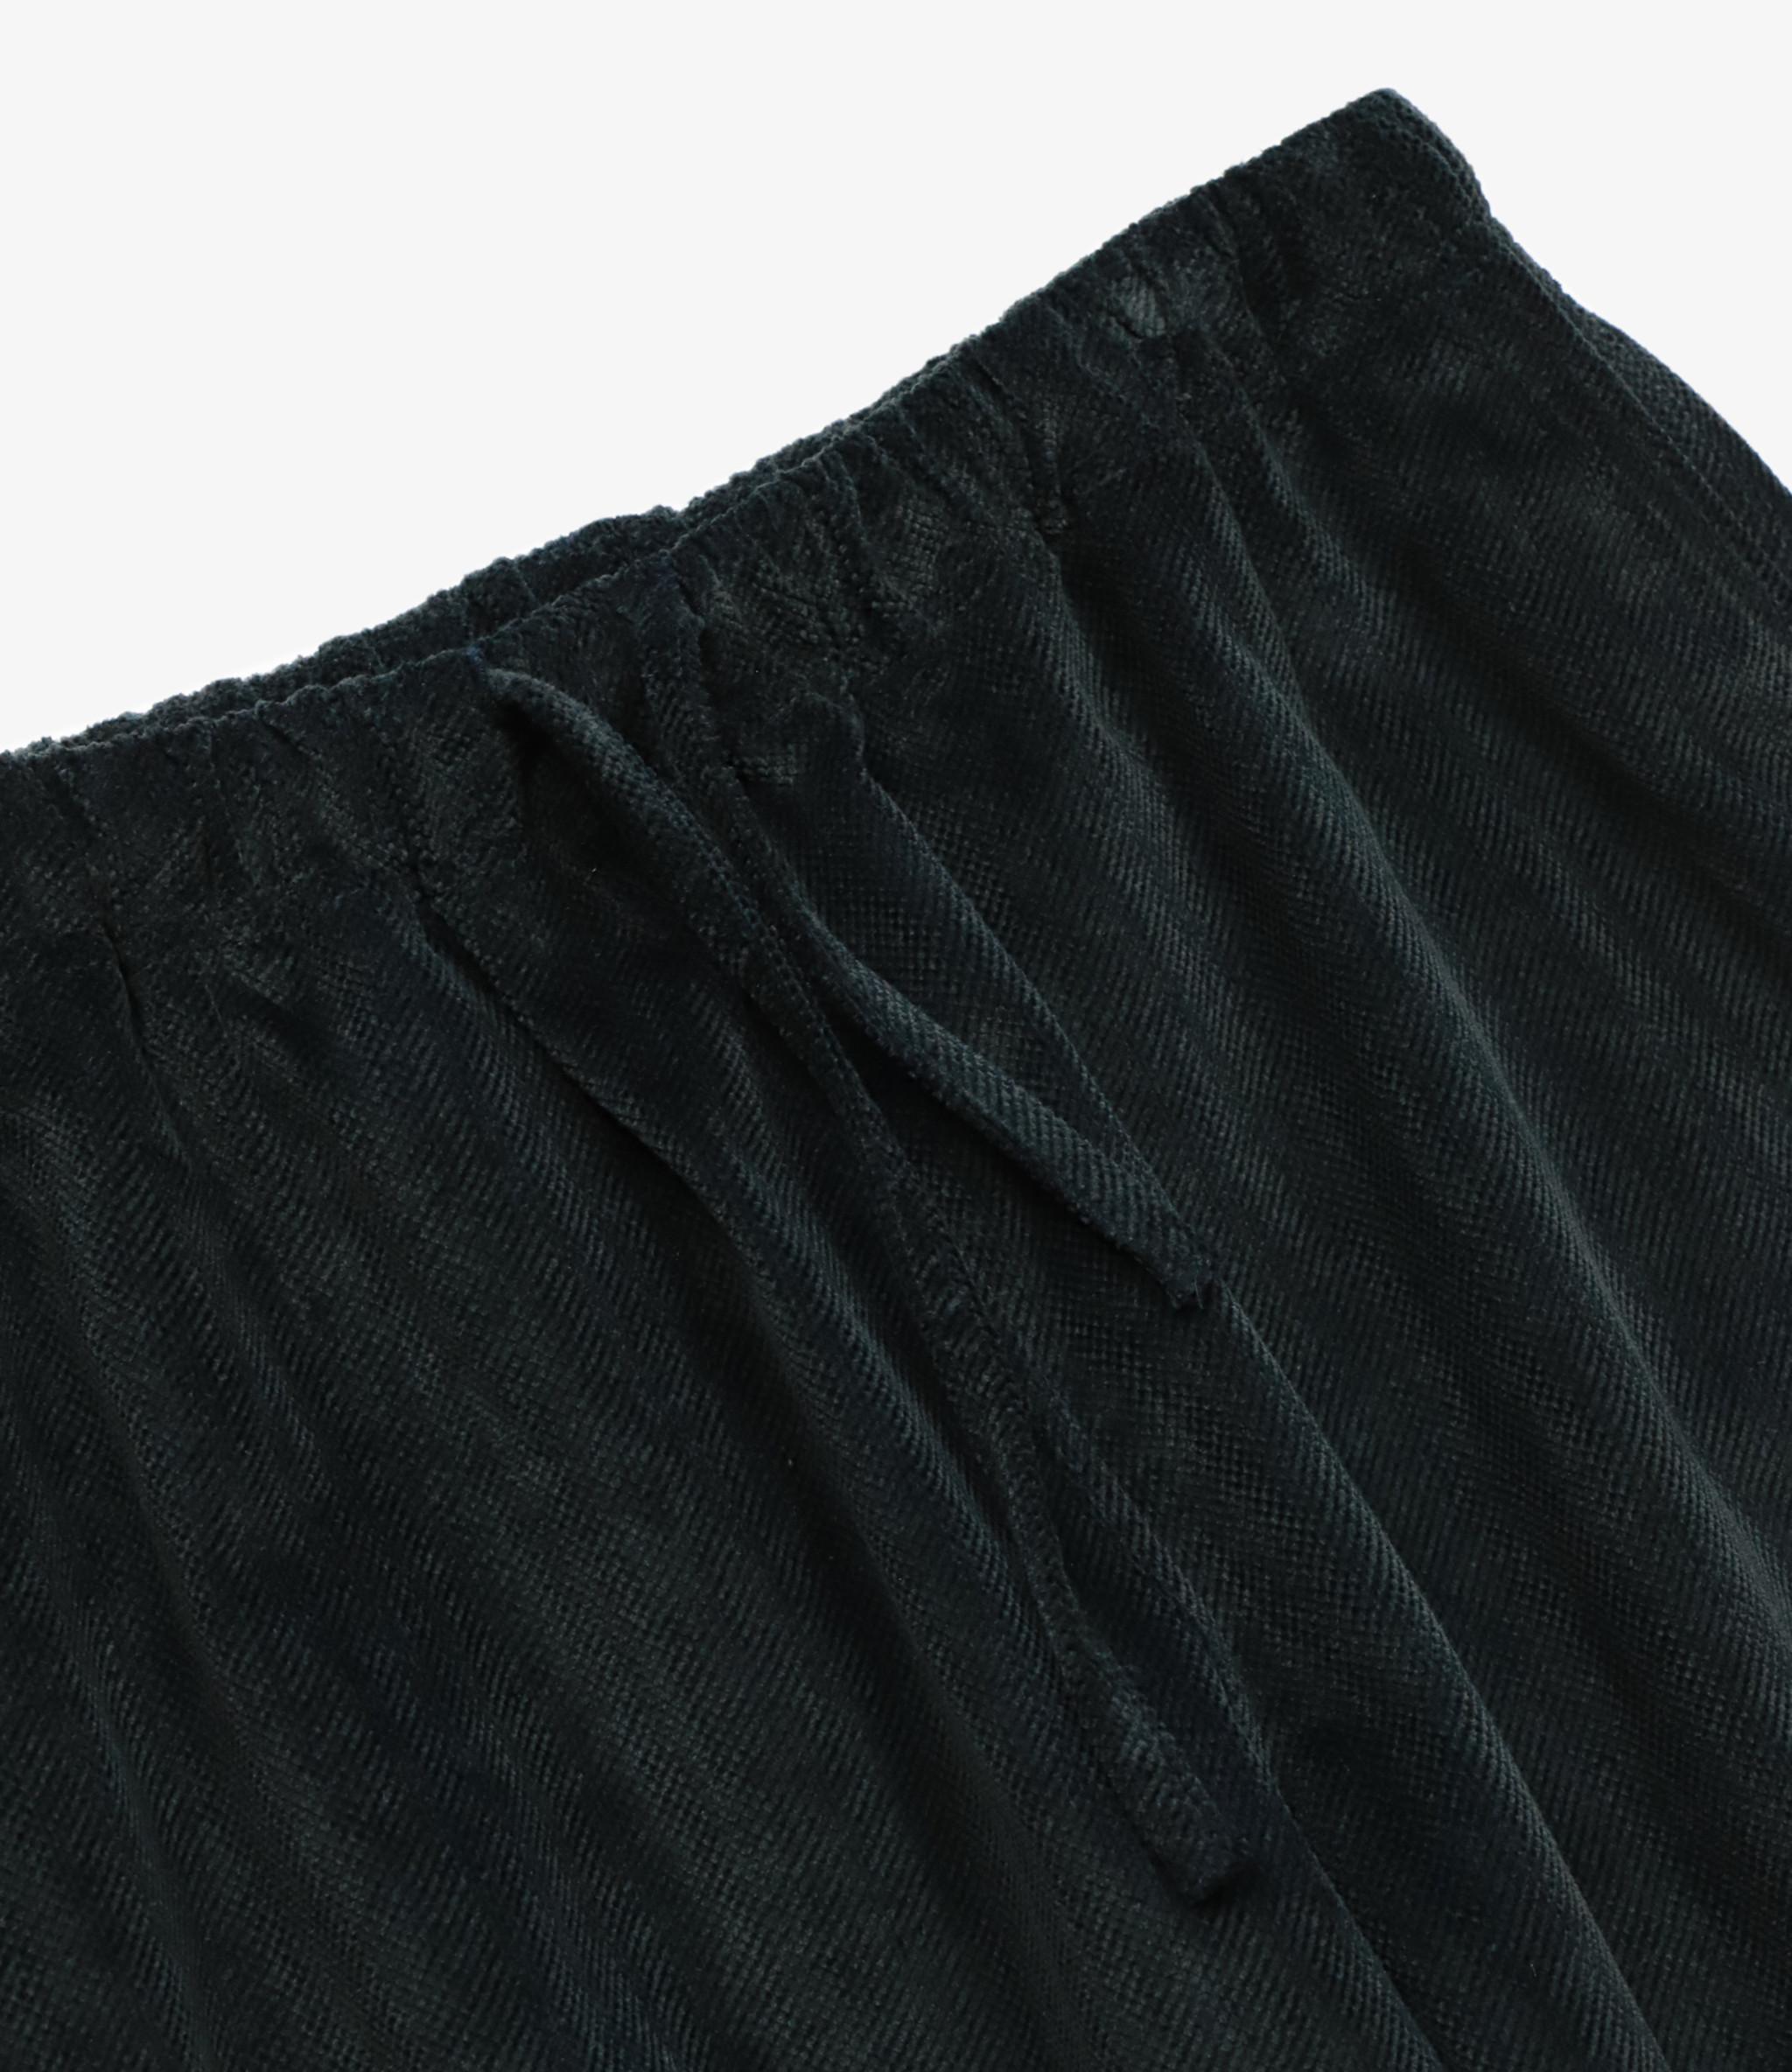 South2 West8 String Slack Pant Cotton Twill-Cut Corduroy - Black